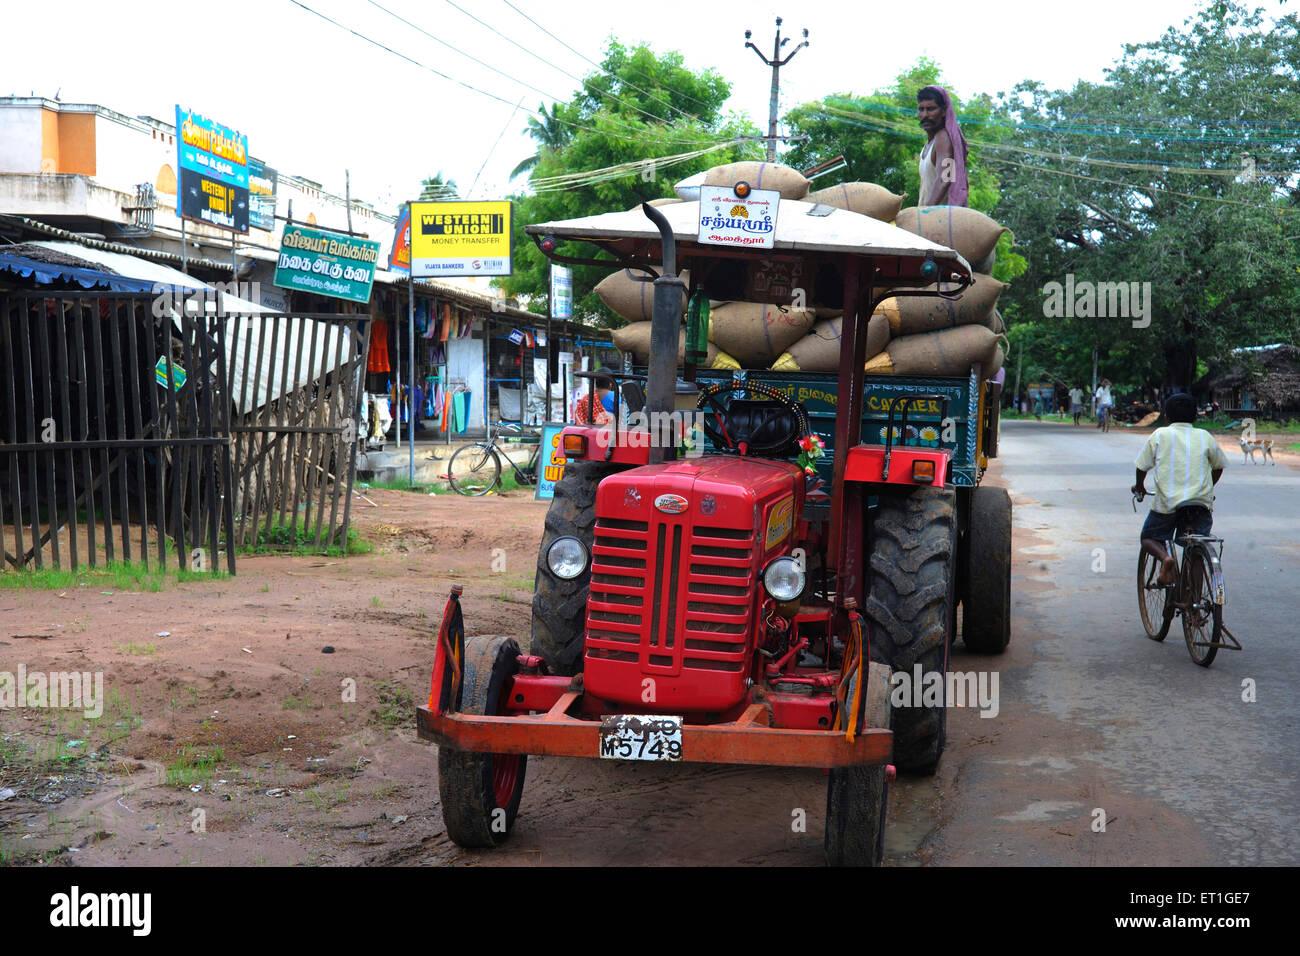 Tractor by ngo kshtriya gramin financial services by IFMR foundation ;  Thanjavur ; Tamil Nadu ;